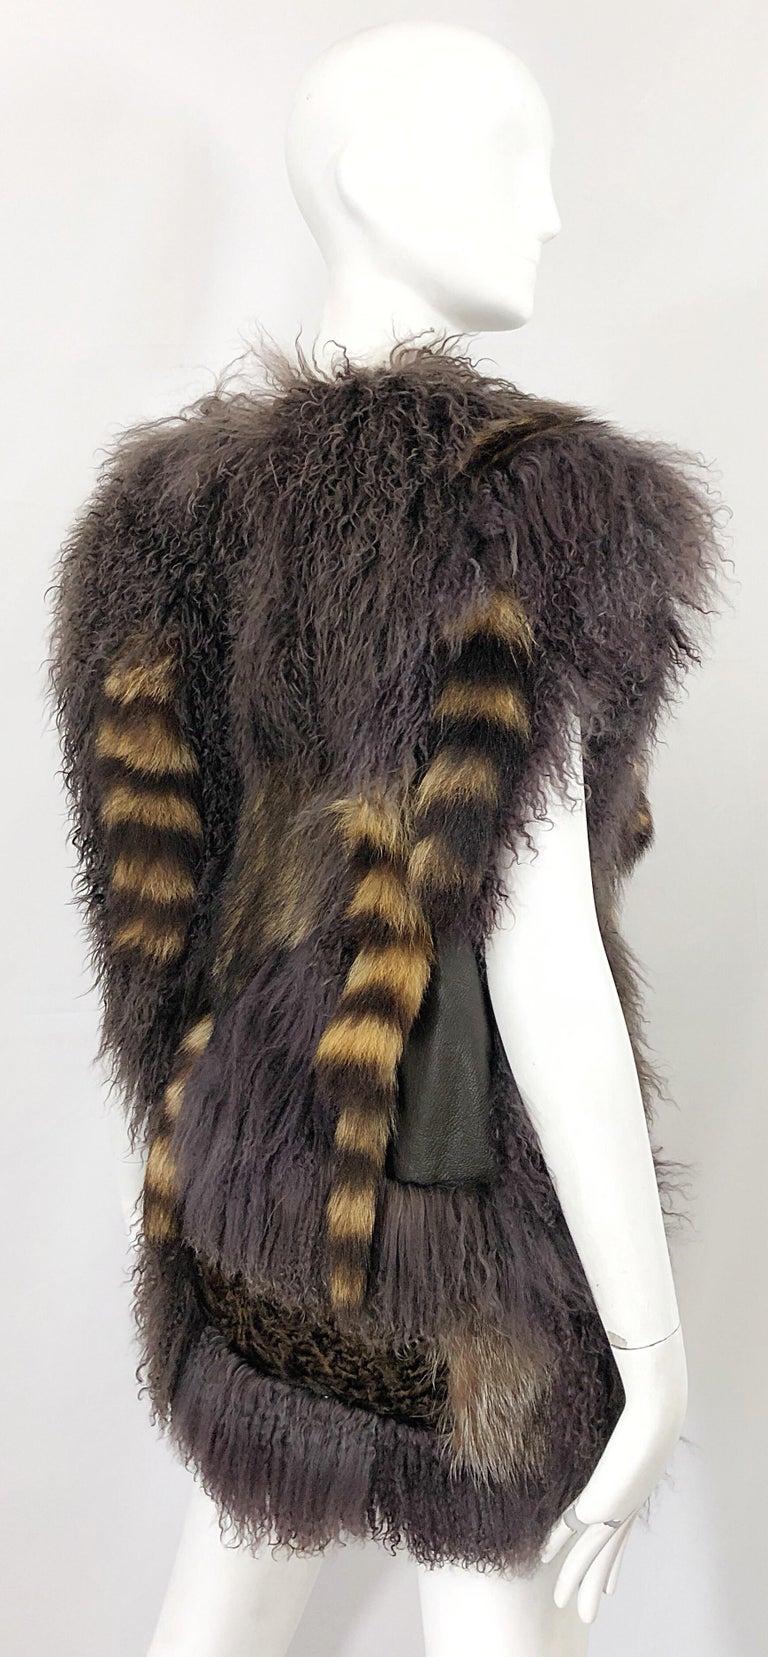 Vintage Amen Wardy 1970s Avant Garde Grey + Brown Mixed Fur Leather Vest Jacket For Sale 12